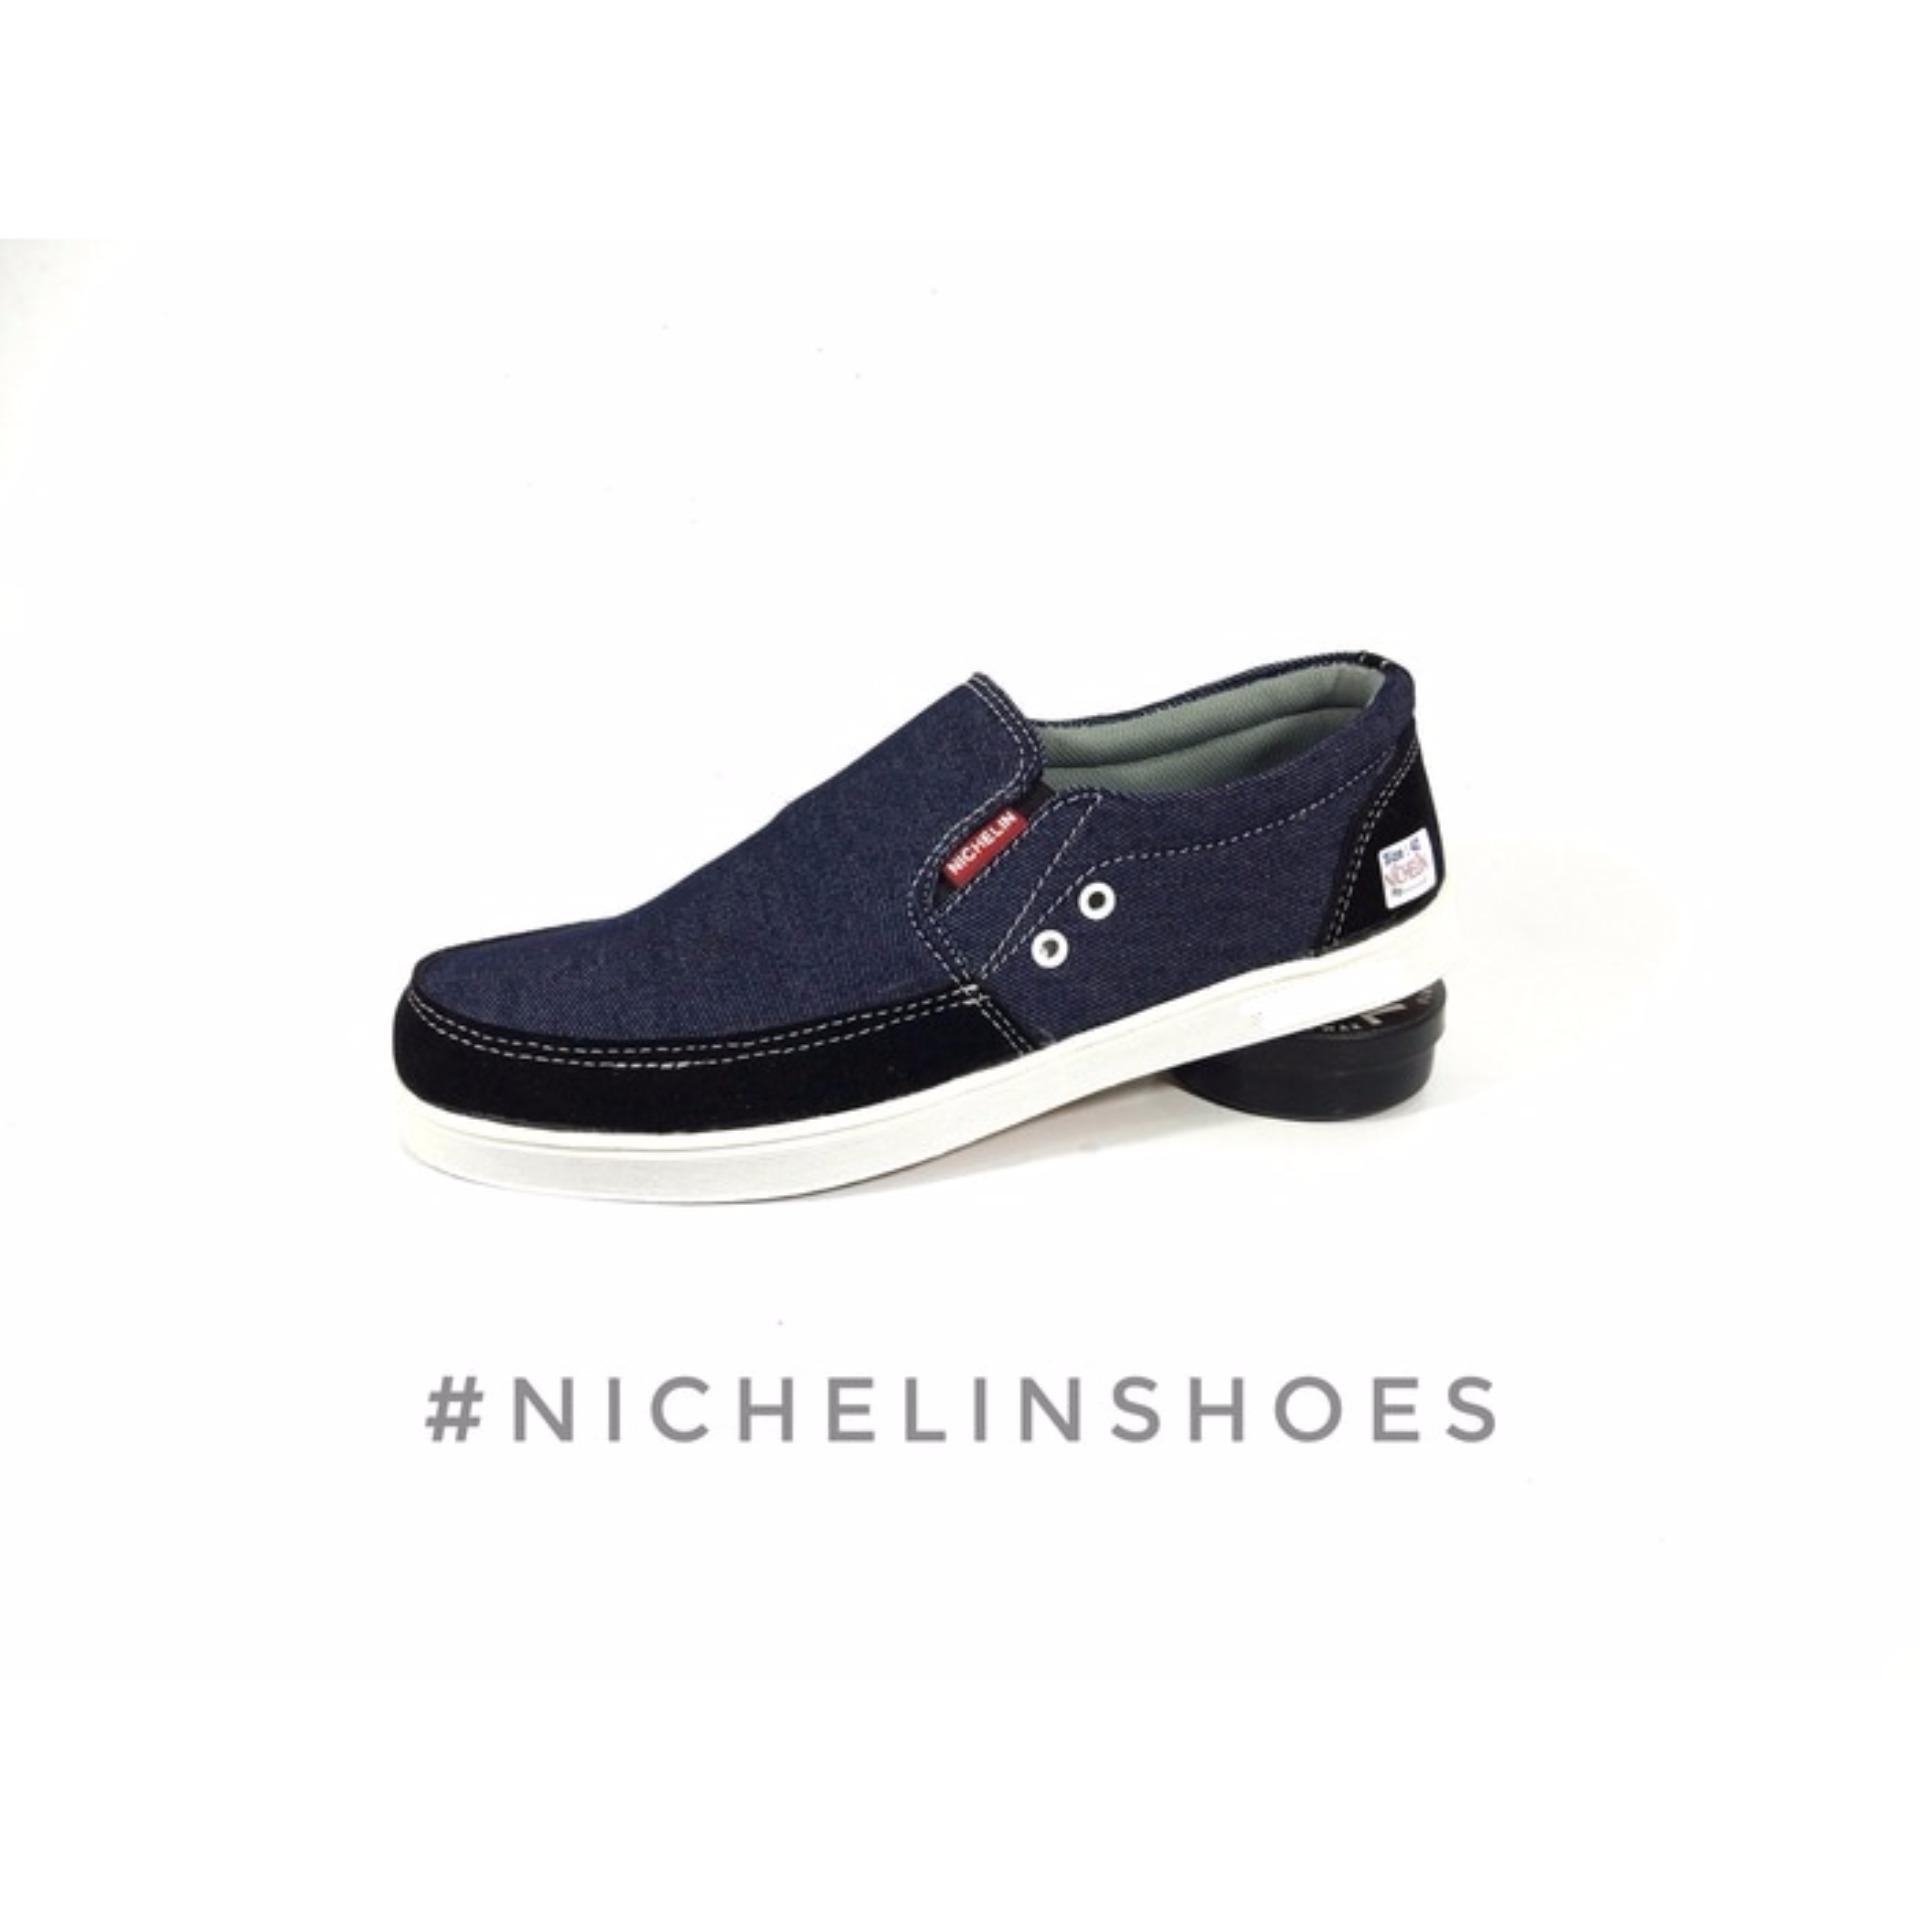 Harga Sepatu Nichelinshoes Nc 10 Sepatu Casual Sepatu Formal Sepatu Santai Sepatu Kerja Online Indonesia